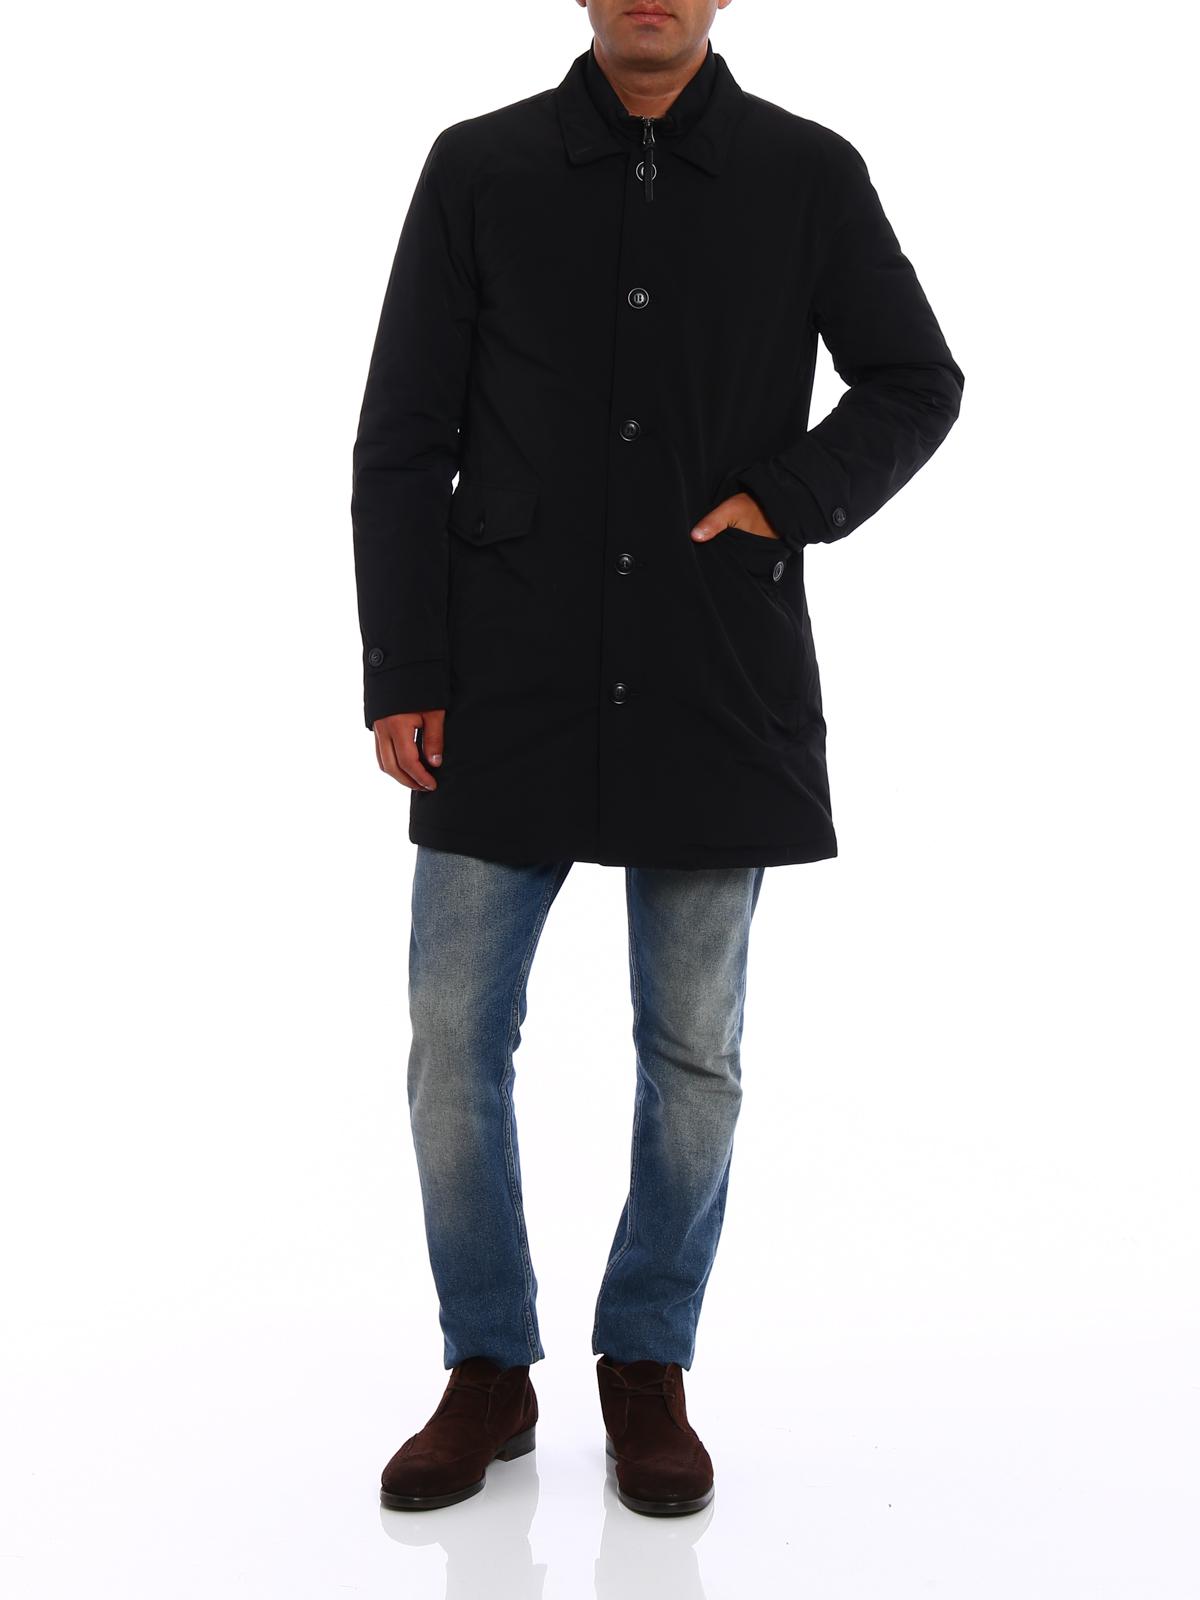 d26d38d8c456 WOOLRICH  padded coats online - Turner wind proof black warm coat